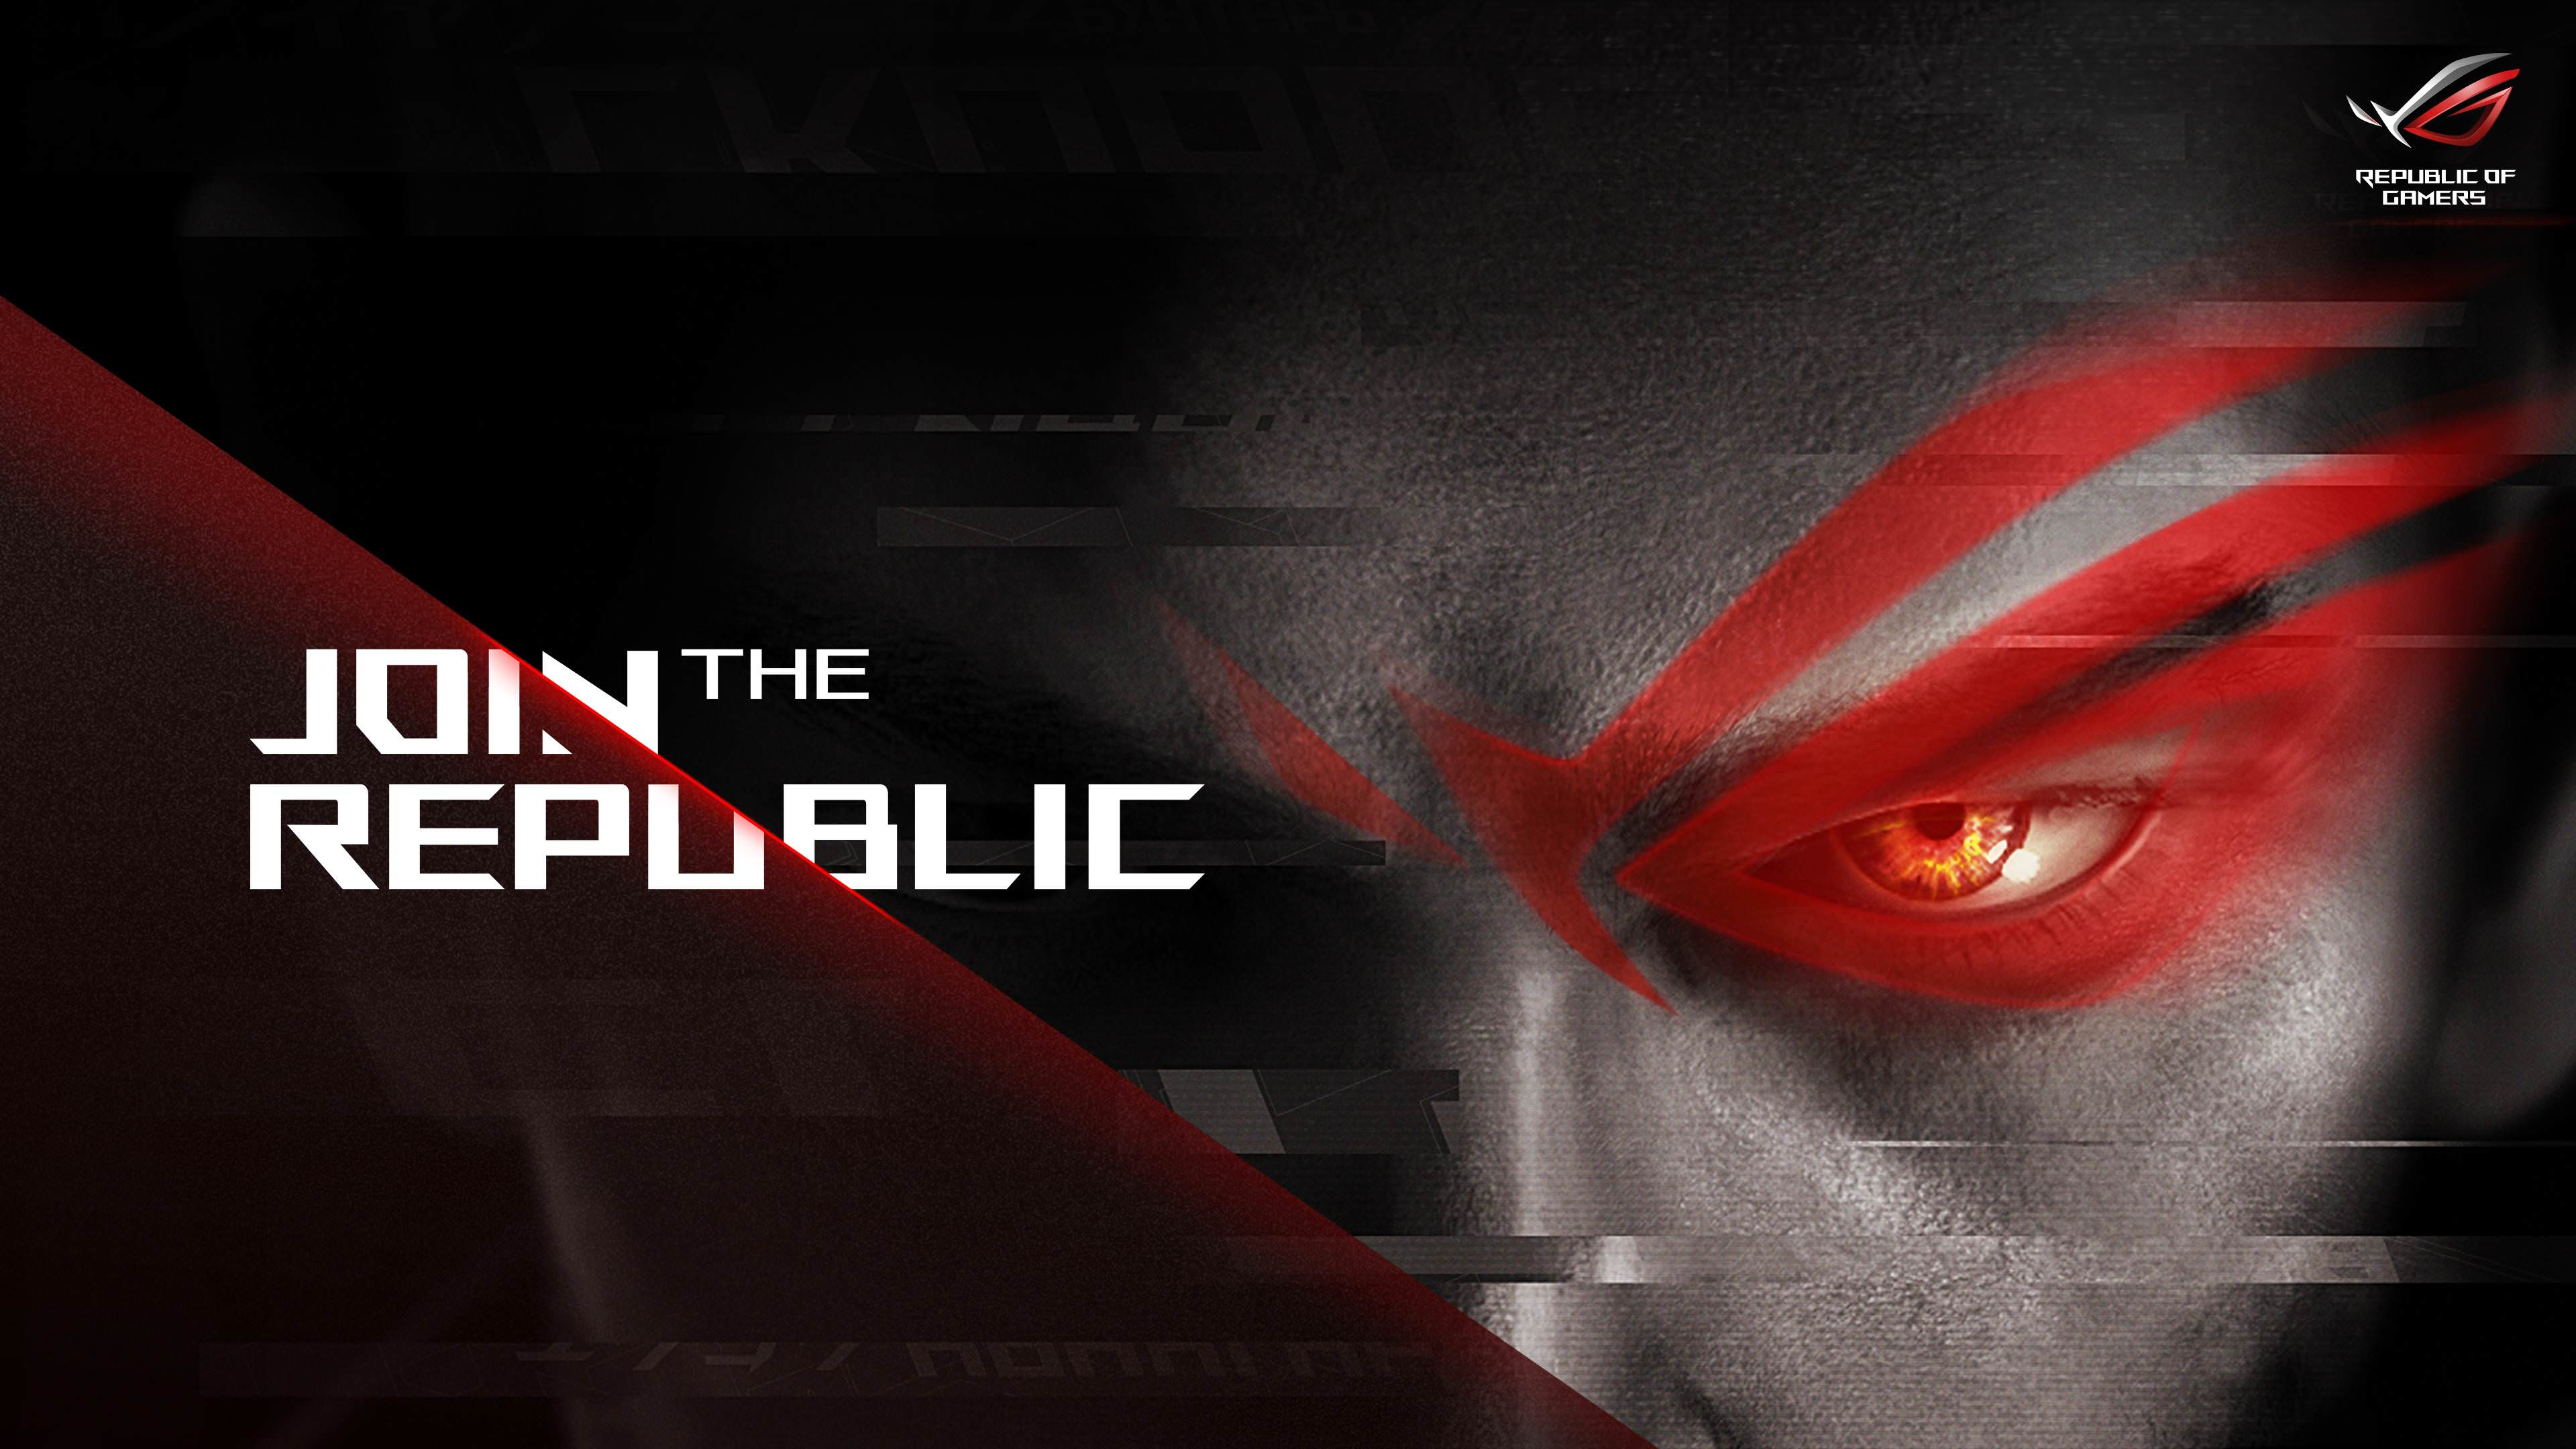 Republic Of Gamers 4k Wallpapers Top Free Republic Of Gamers 4k